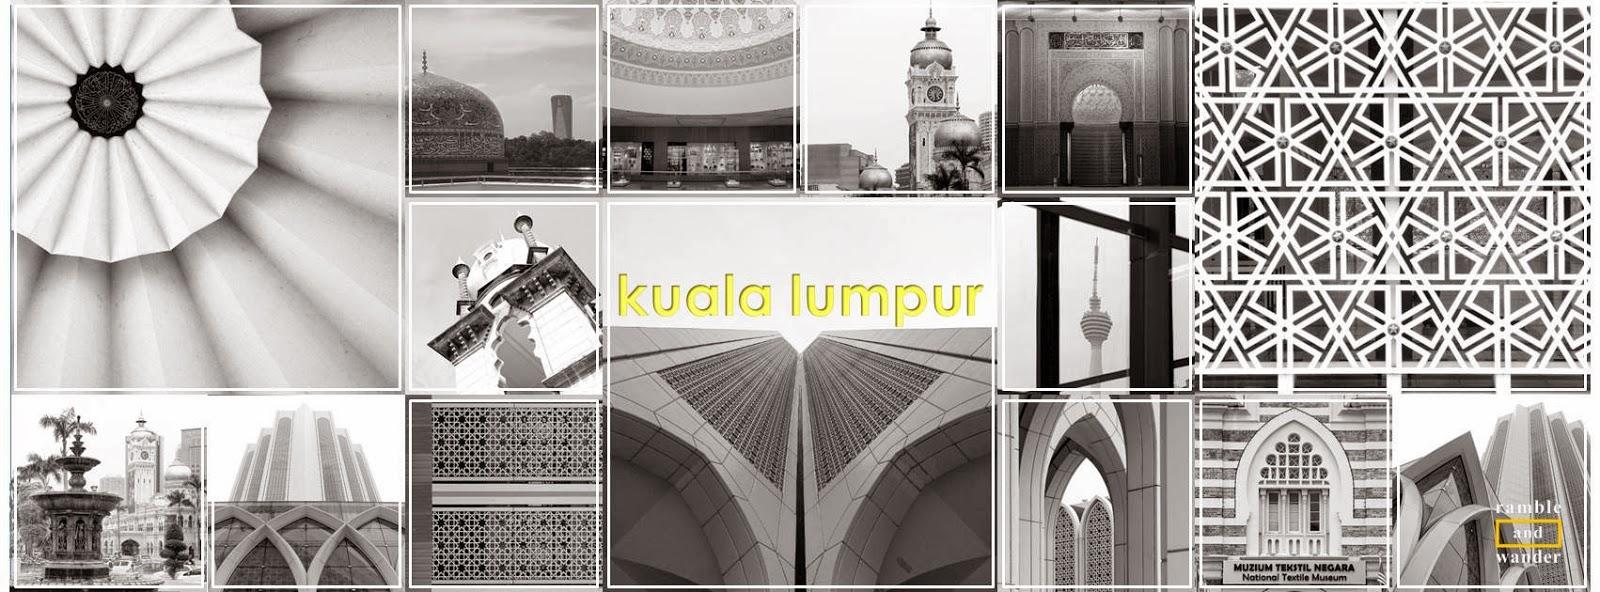 Kuala Lumpur in Black and White